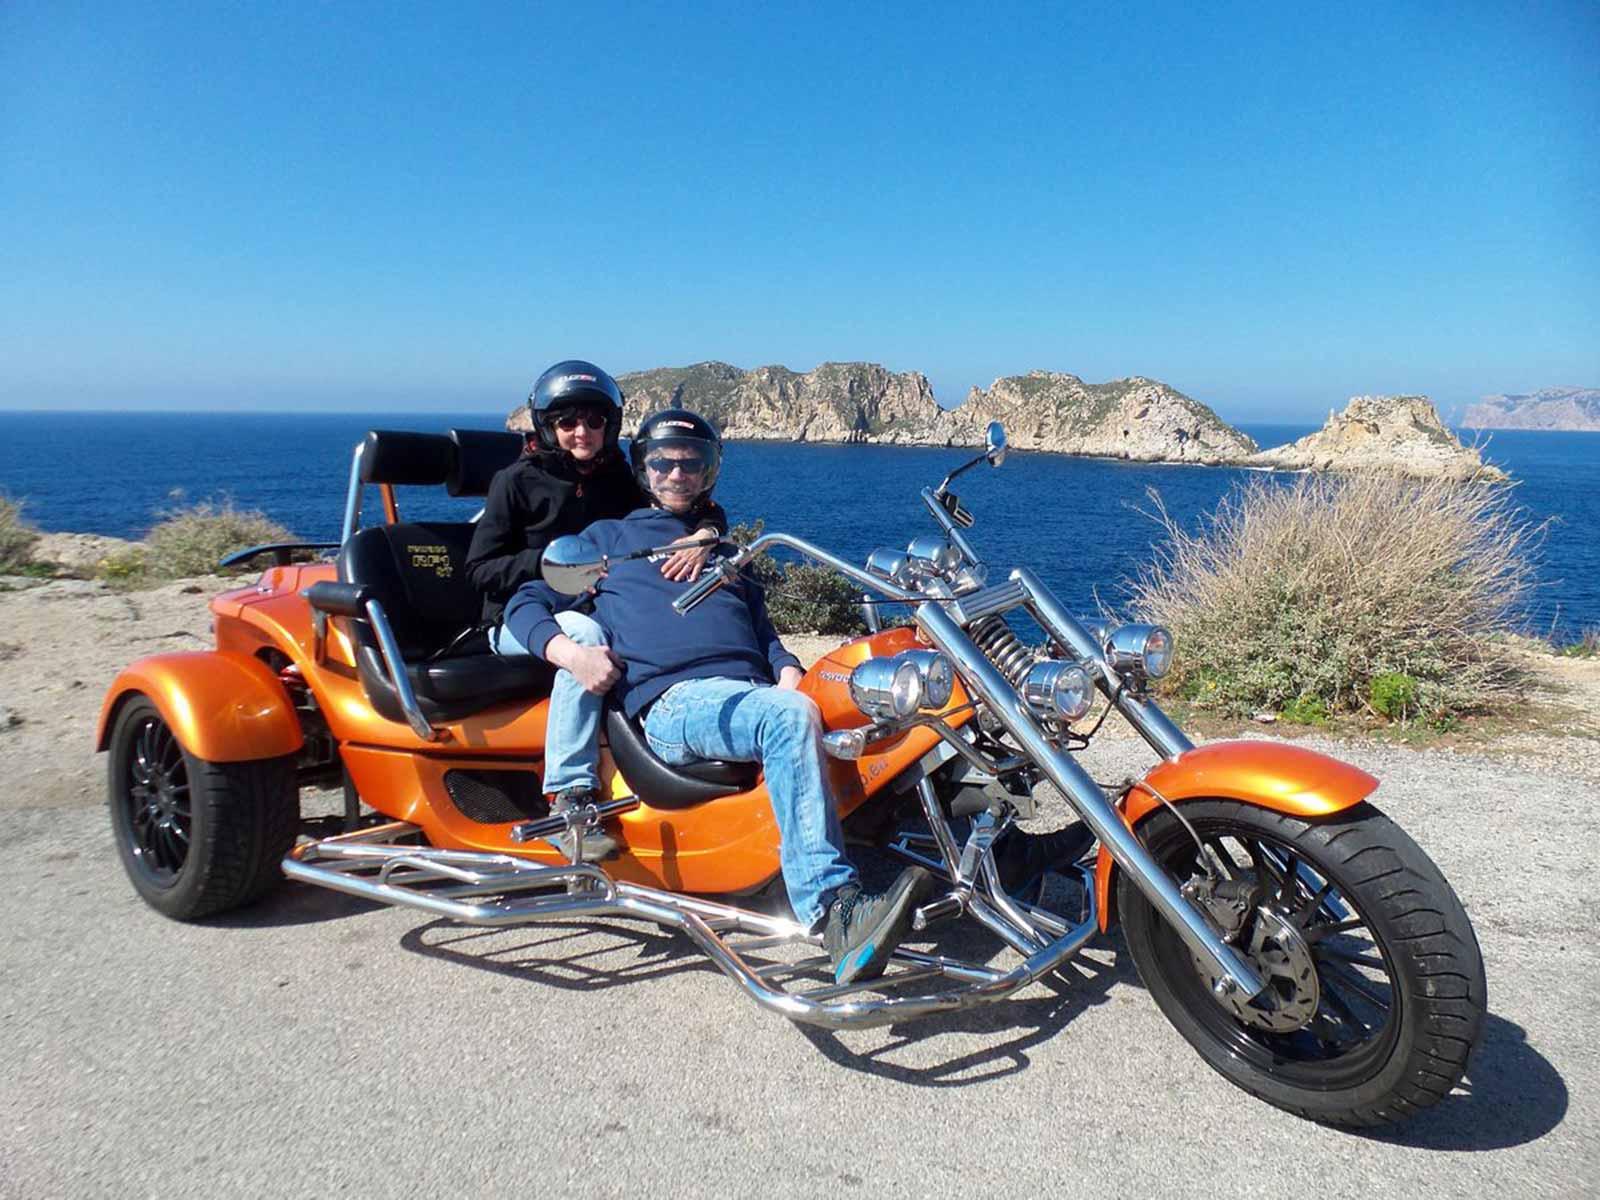 Trike-Mallorca-Trike-Tour-Mallorca-12